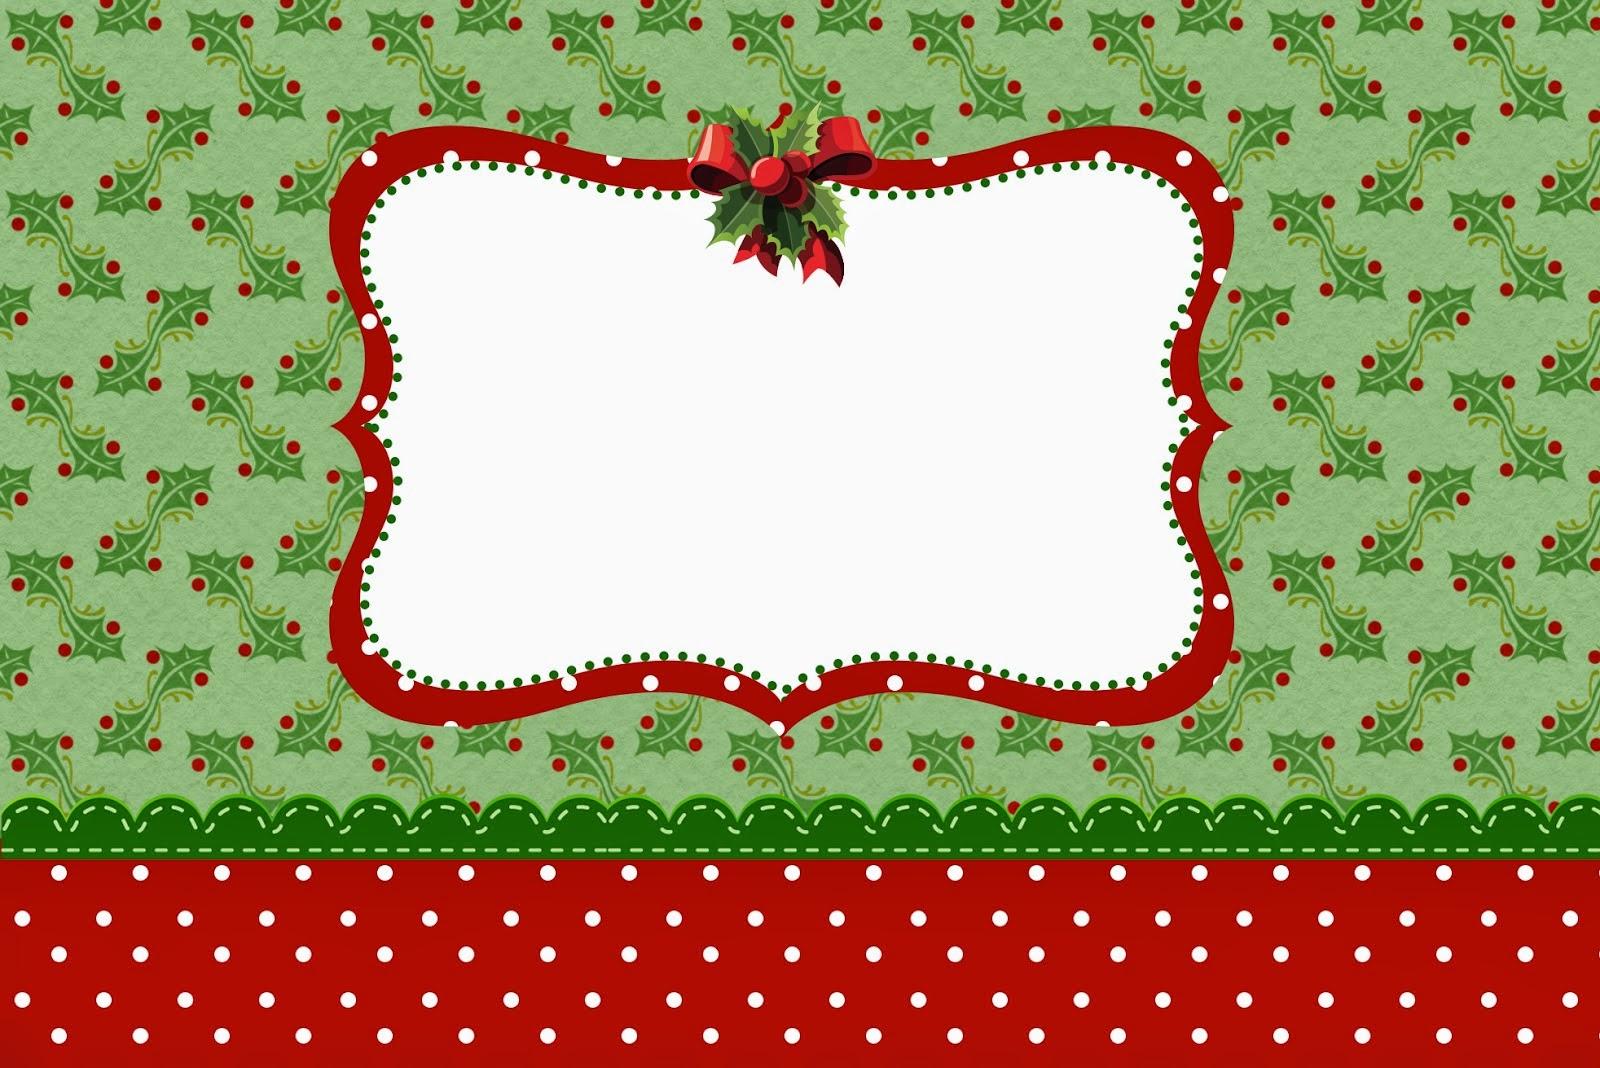 Charming Christmas Free Printable Invitations Or Cards